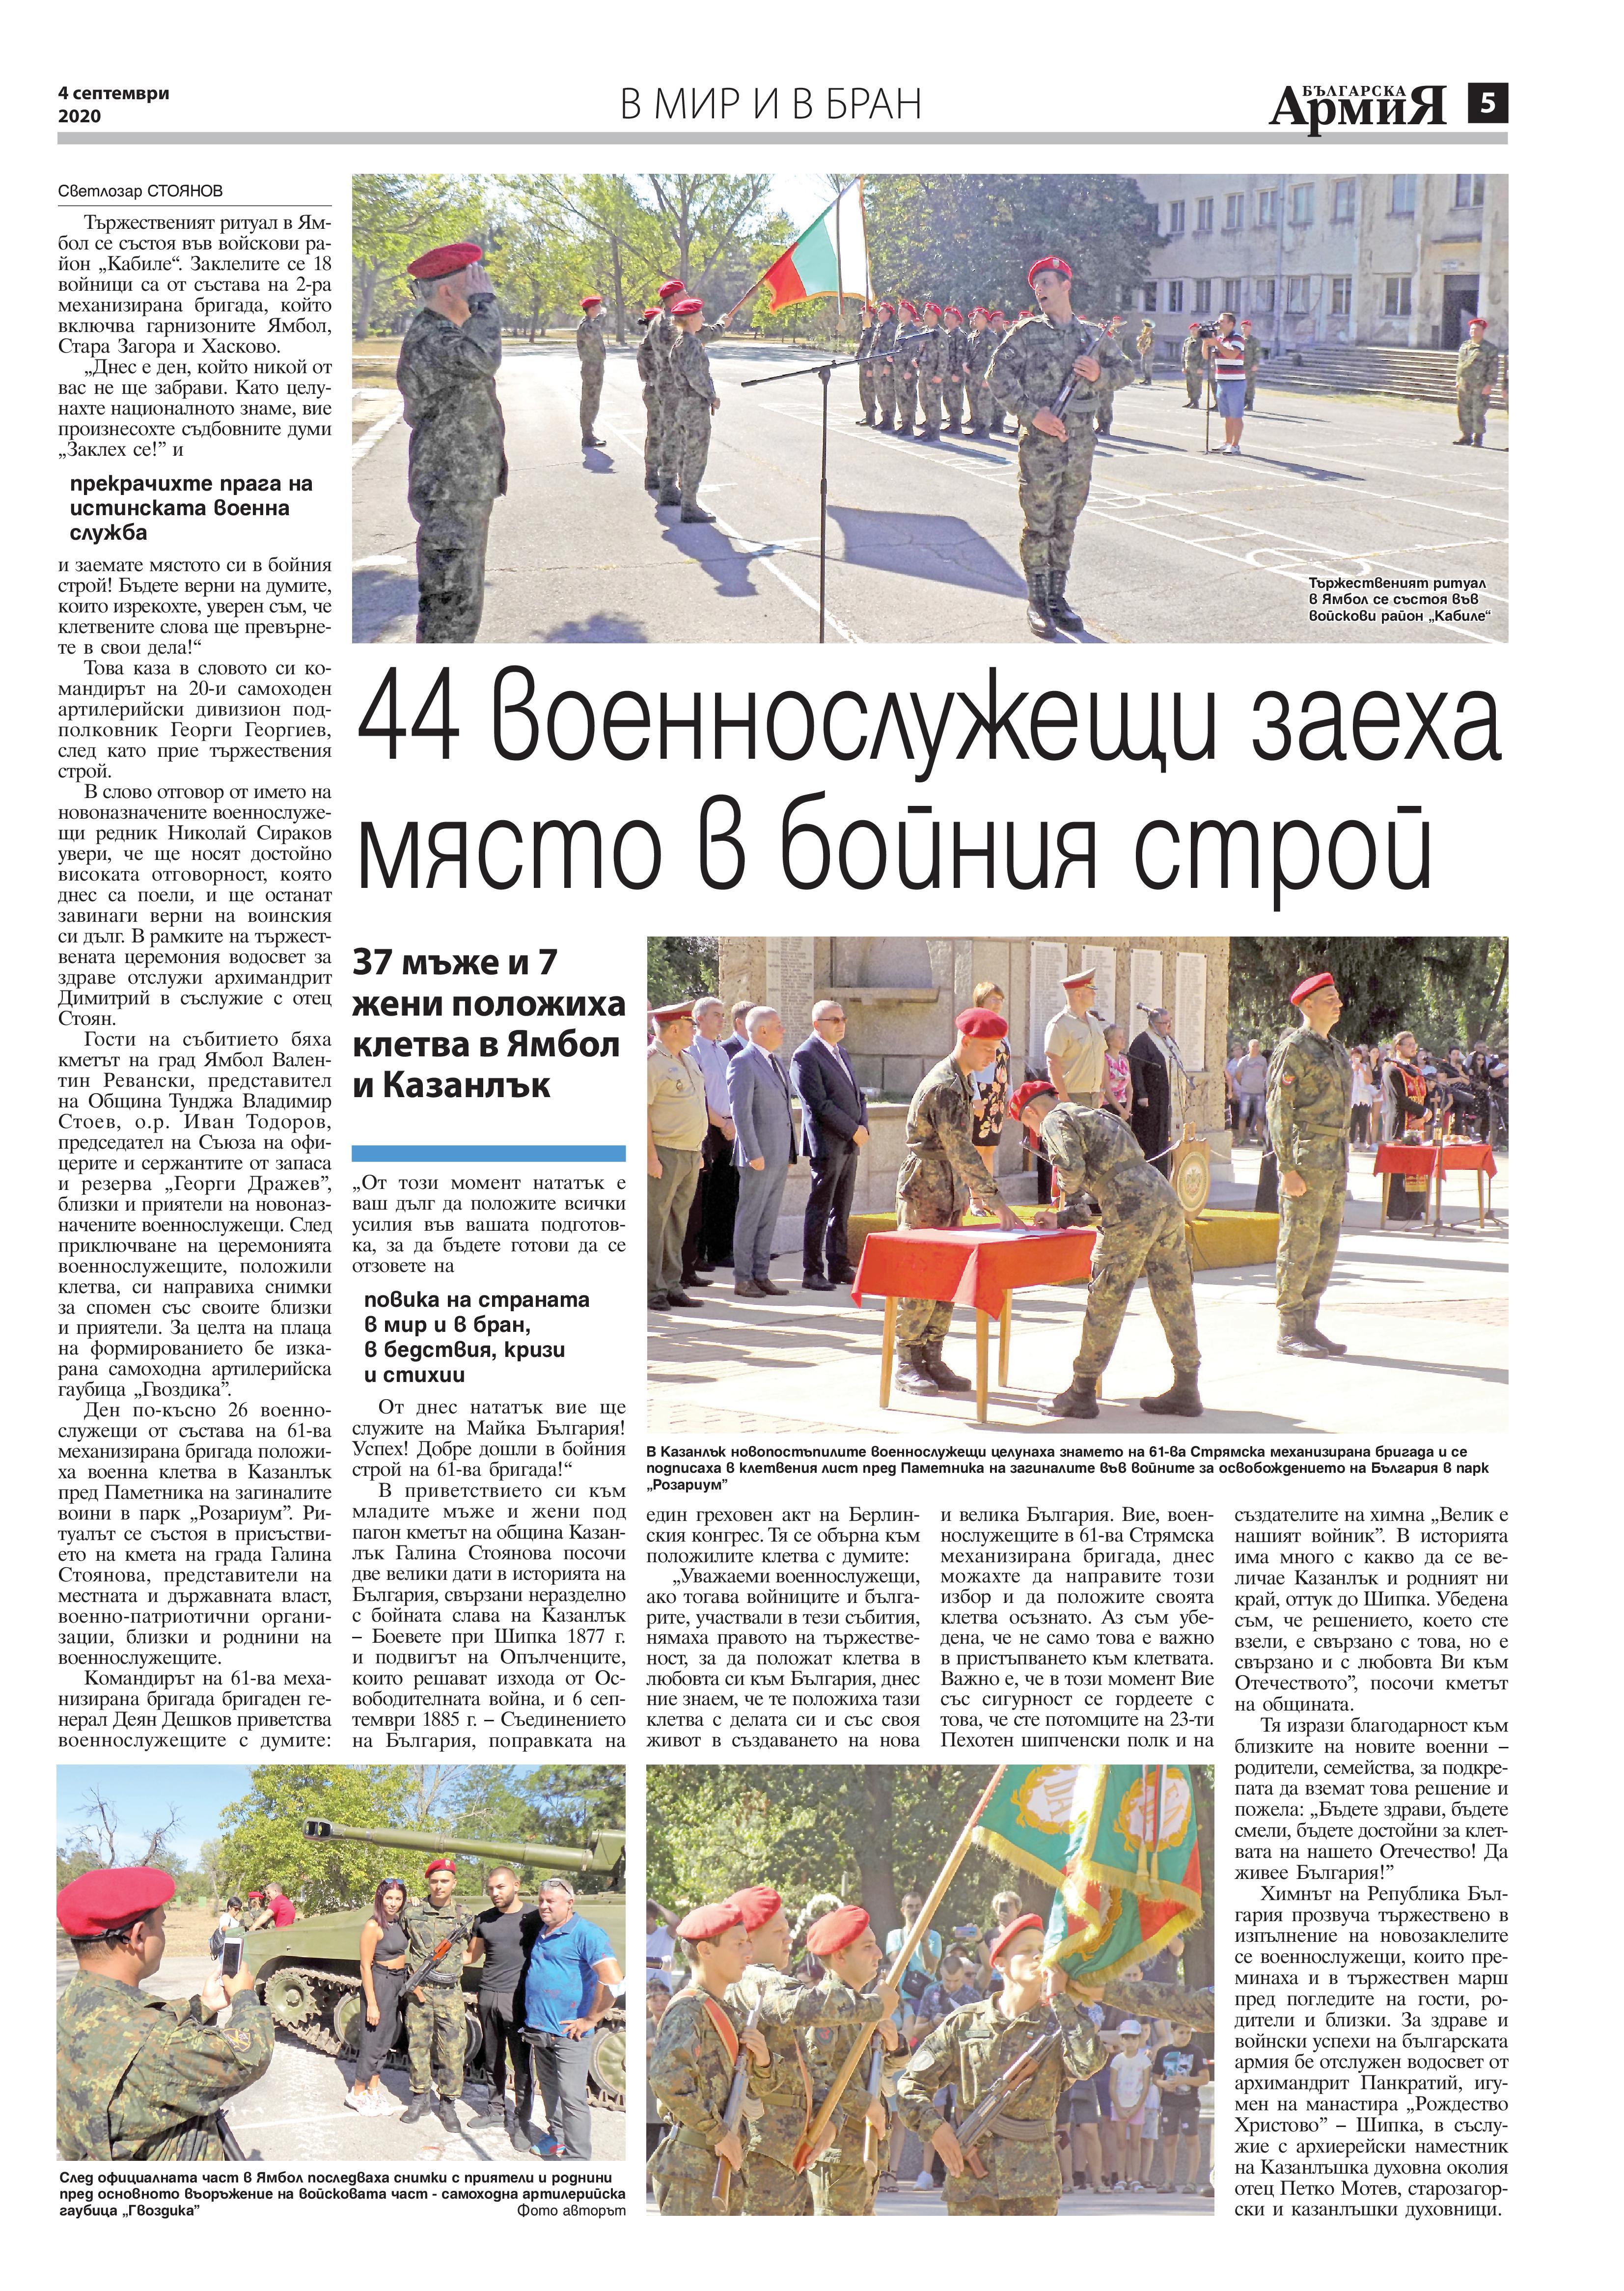 https://www.armymedia.bg/wp-content/uploads/2015/06/05-38.jpg